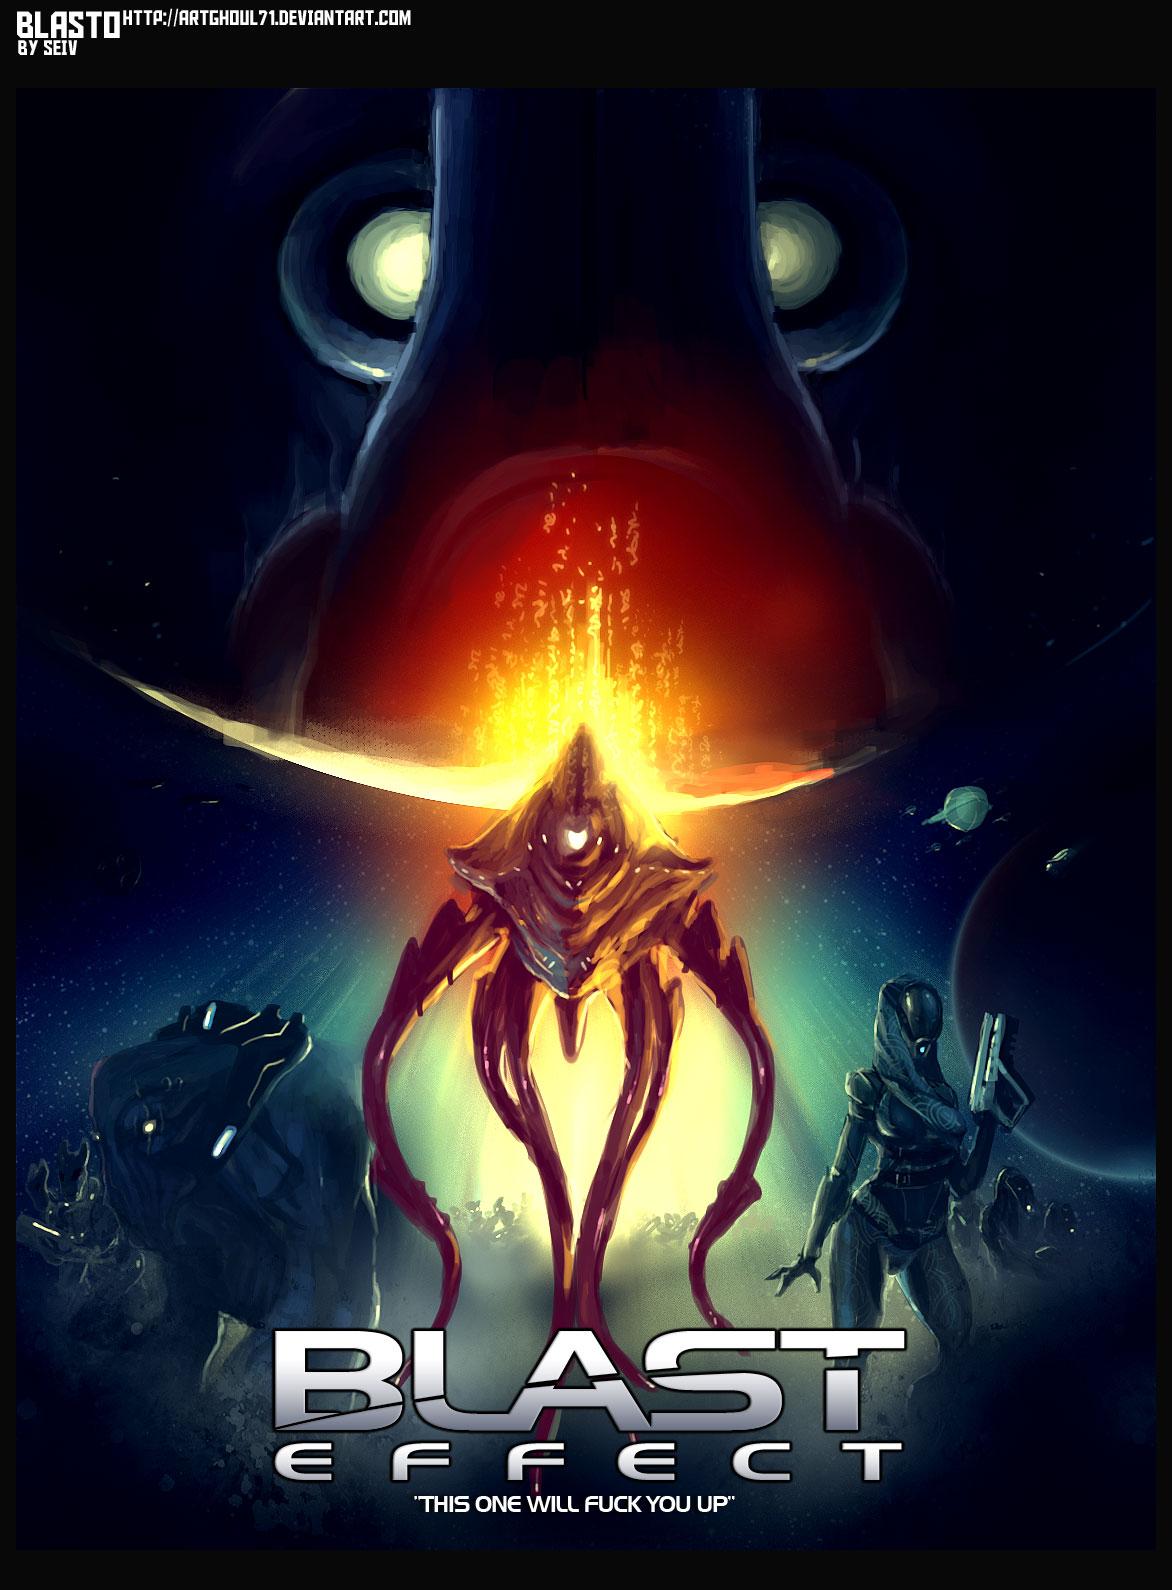 BLASTO - Blast Effect by ArtGhoul71